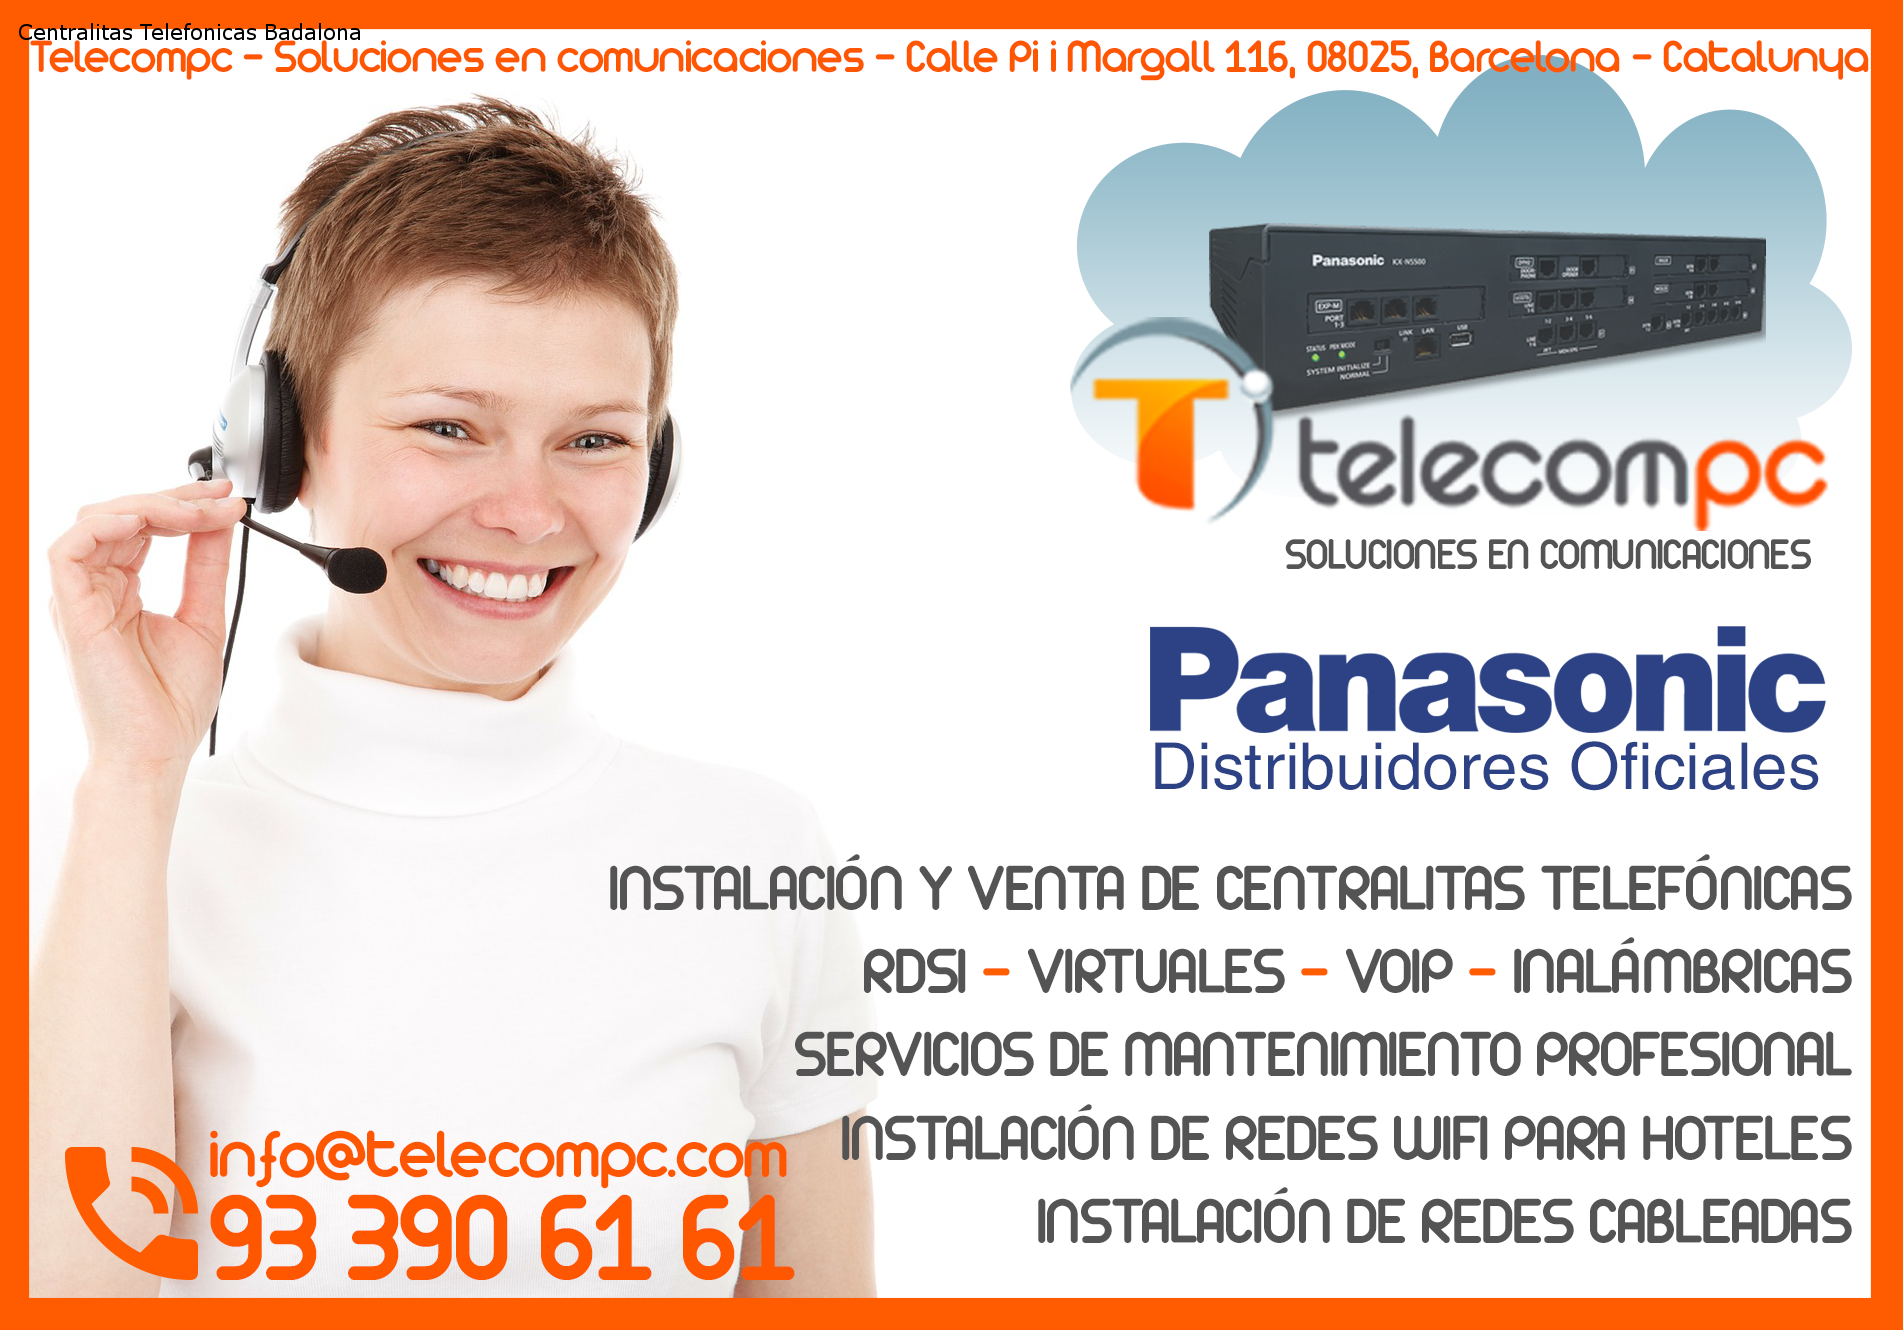 Centralitas Telefonicas Badalona